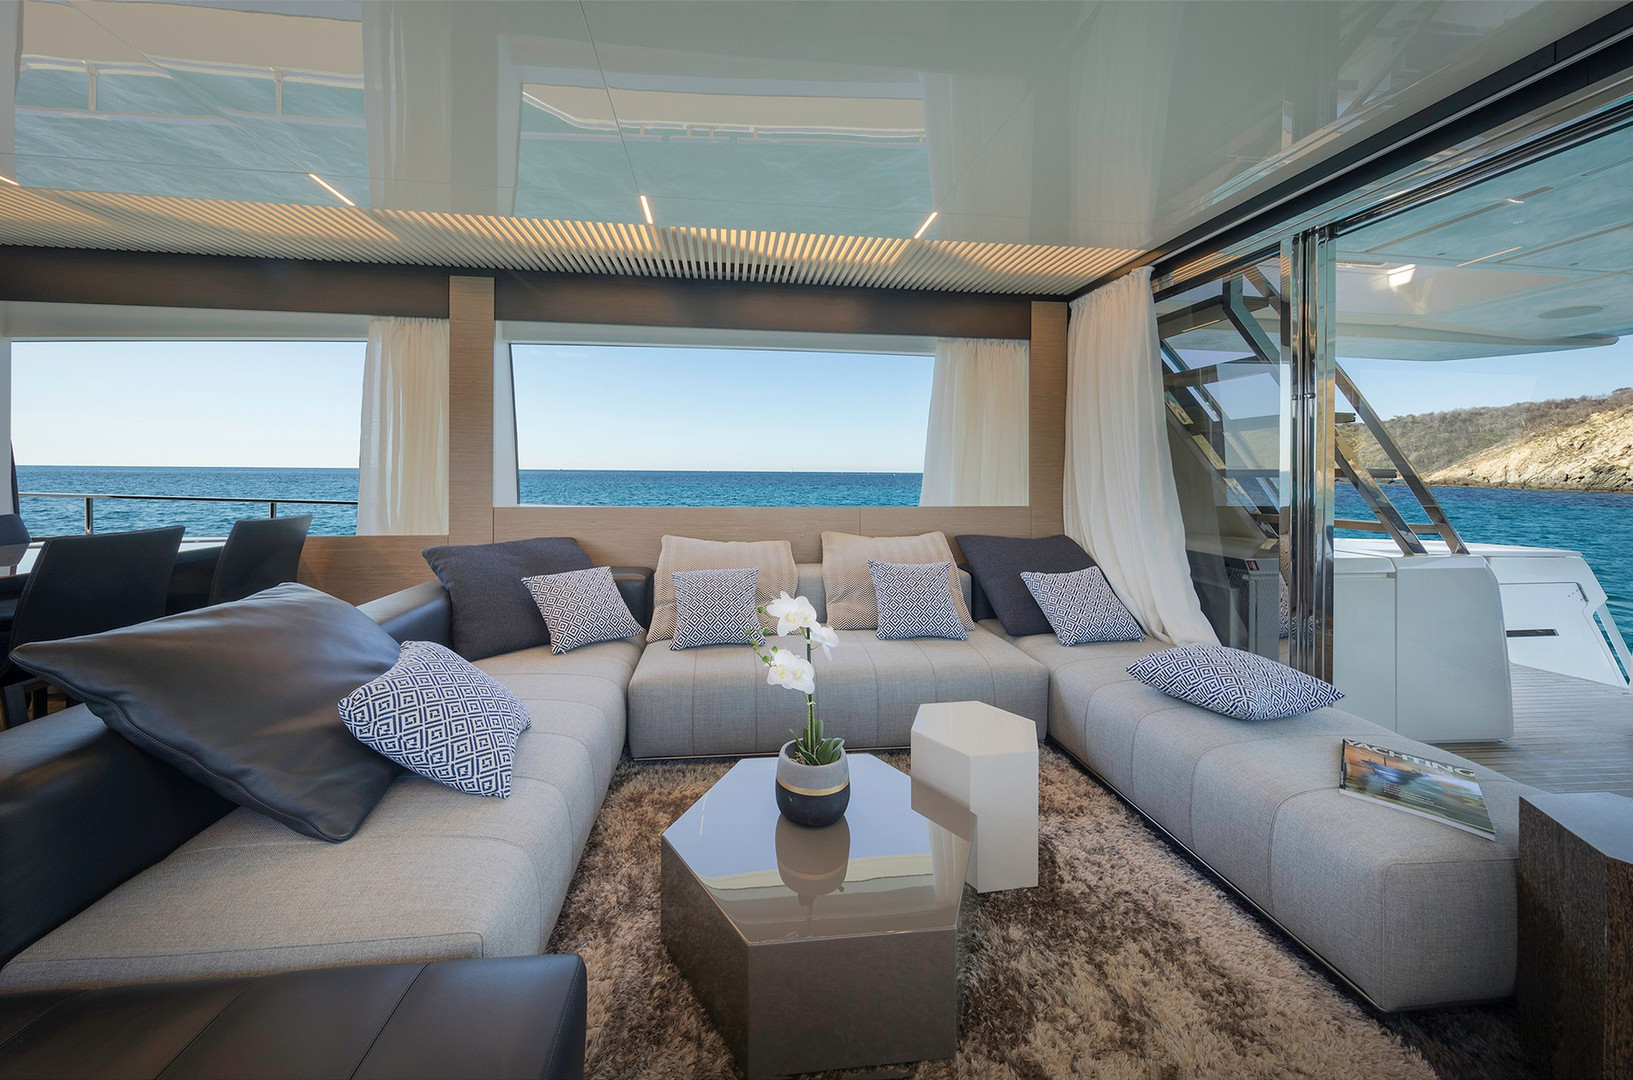 Yacht EPIC - saloon, typical Ferretti Italian sleek styling throughout the interior